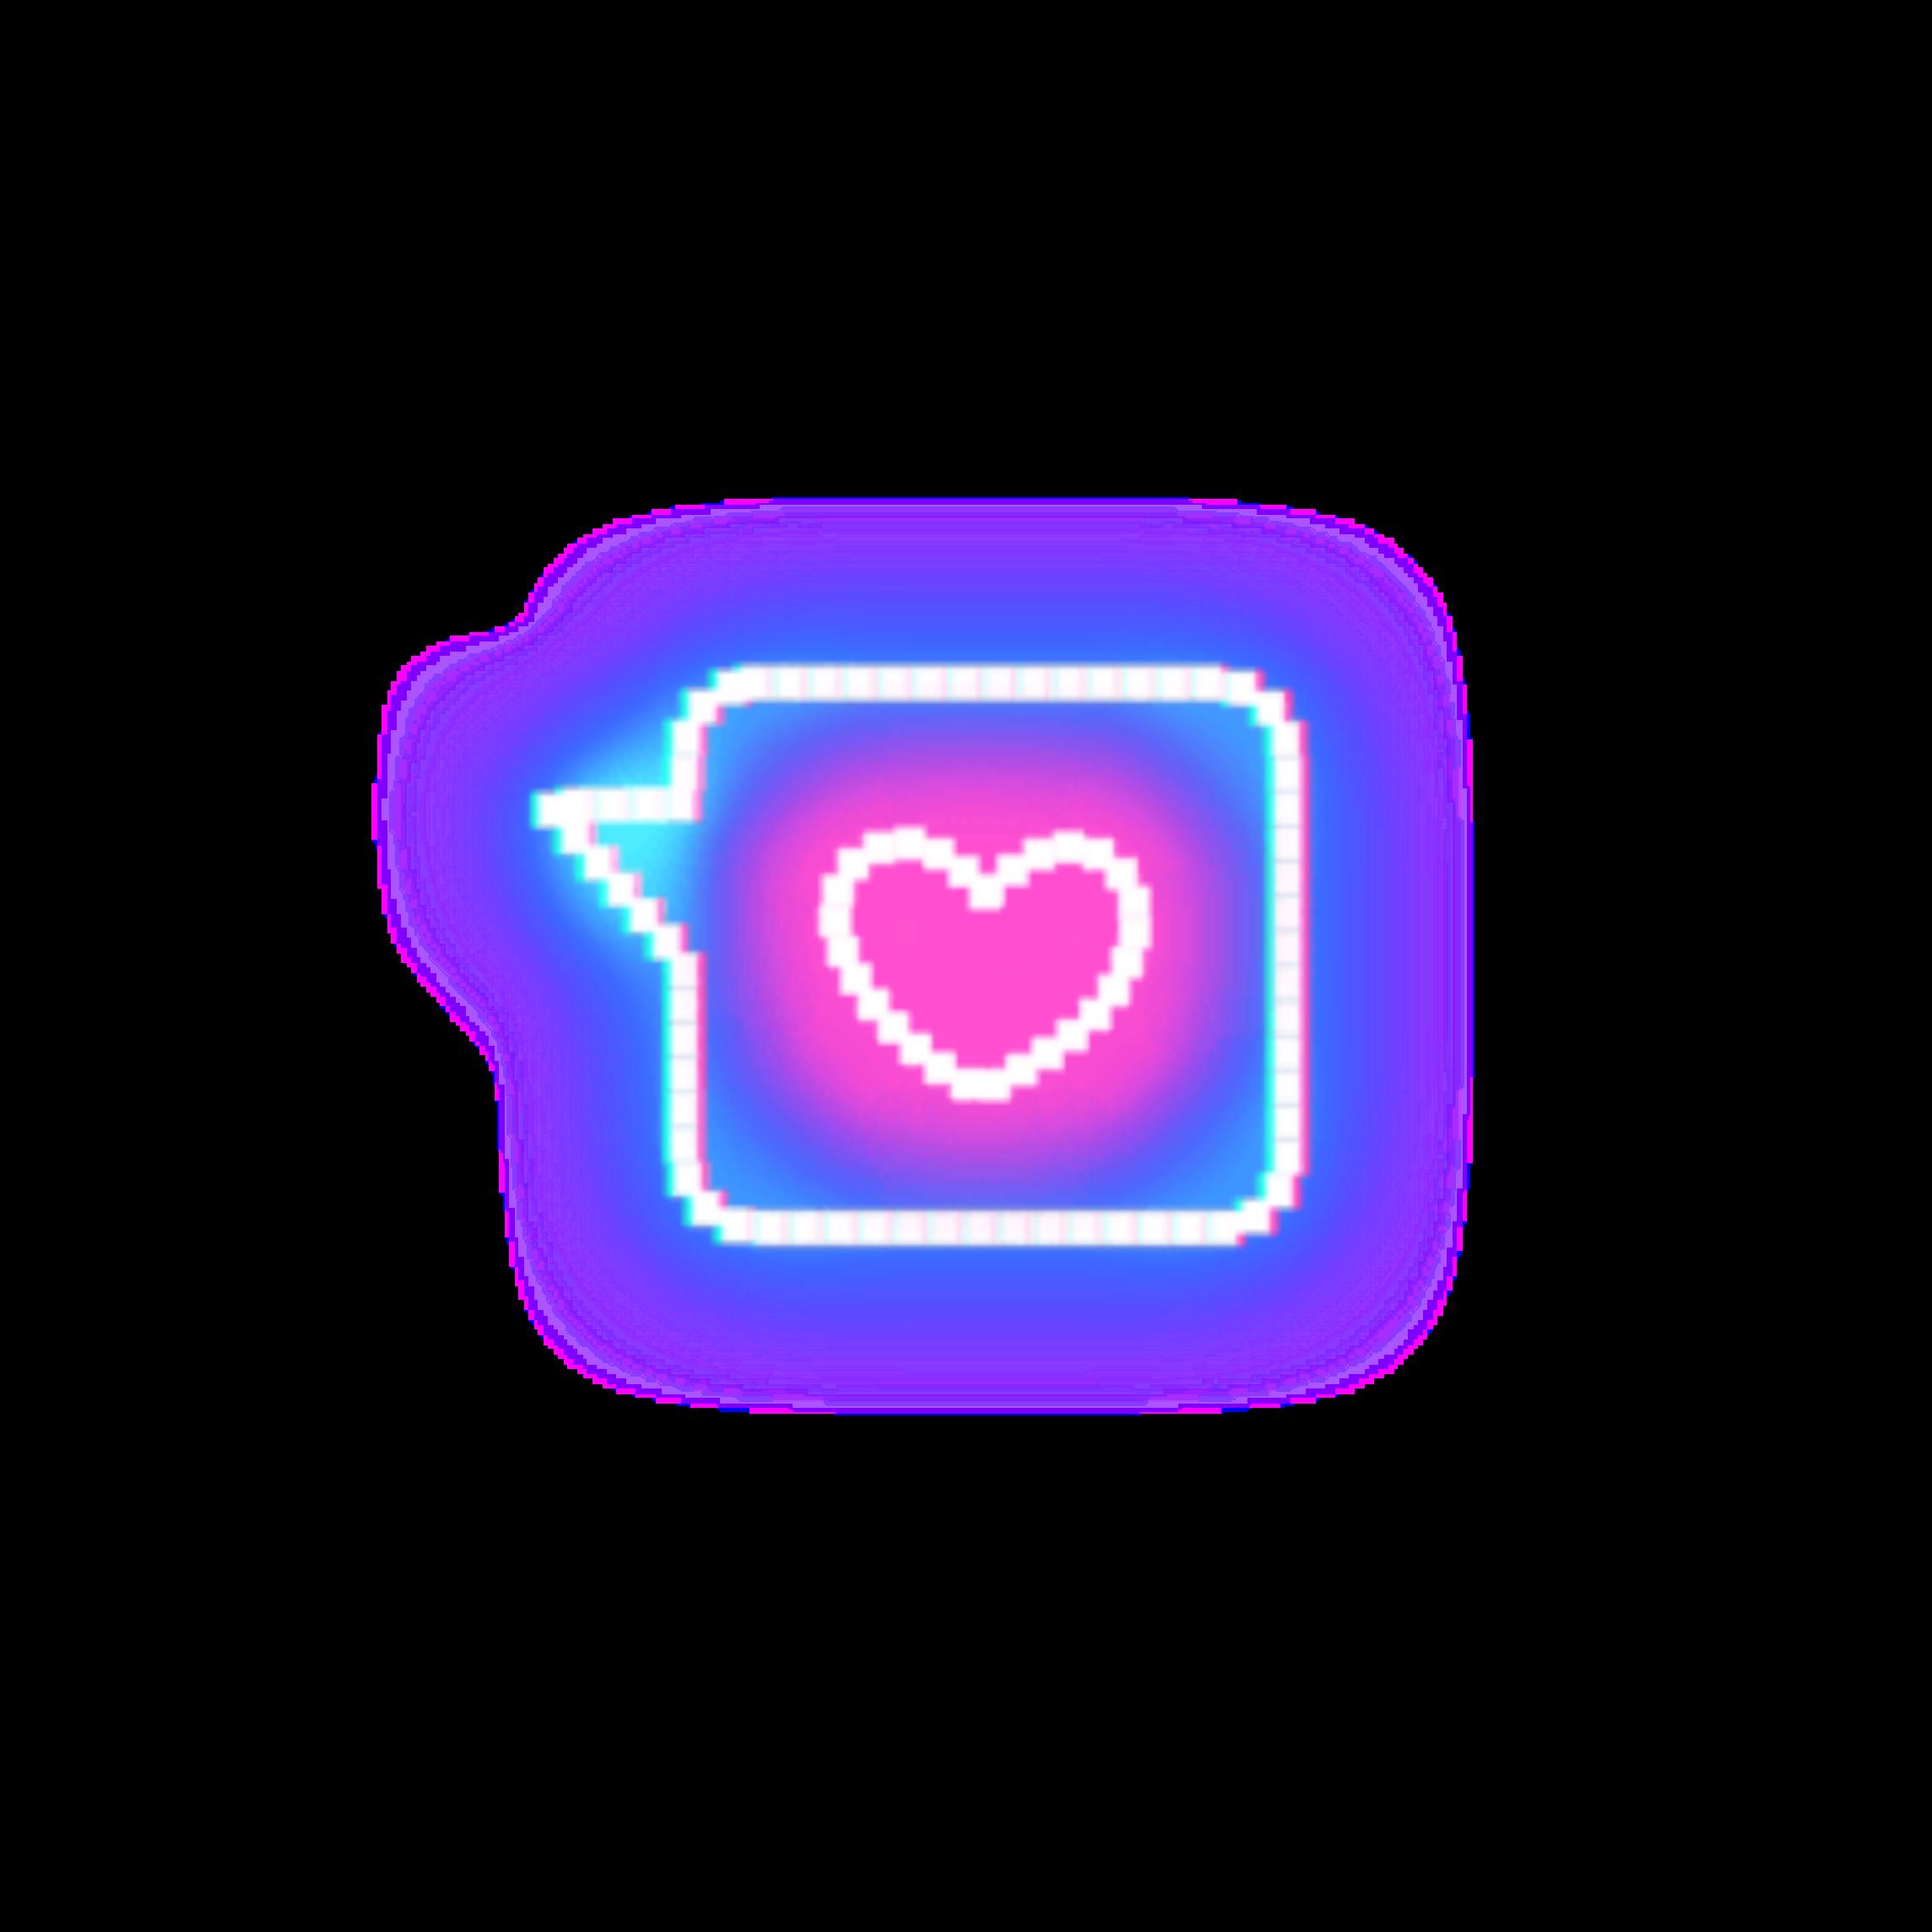 𝘩̅𝘦̅𝘢̅𝘳̅𝘵̅ mensaje in 2020 Cute emoji wallpaper, Neon